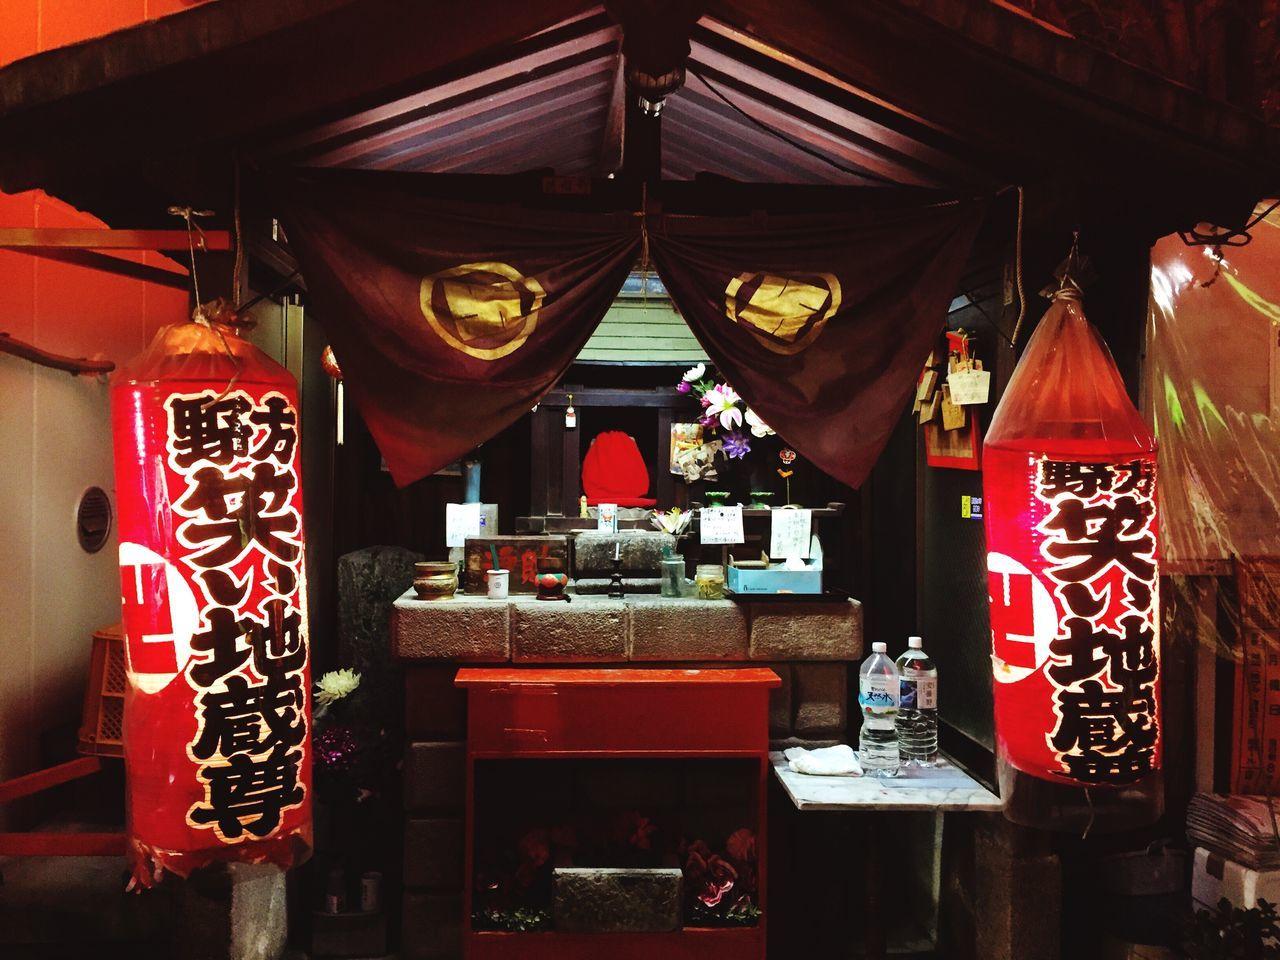 red, night, no people, outdoors, hanging, lantern, illuminated